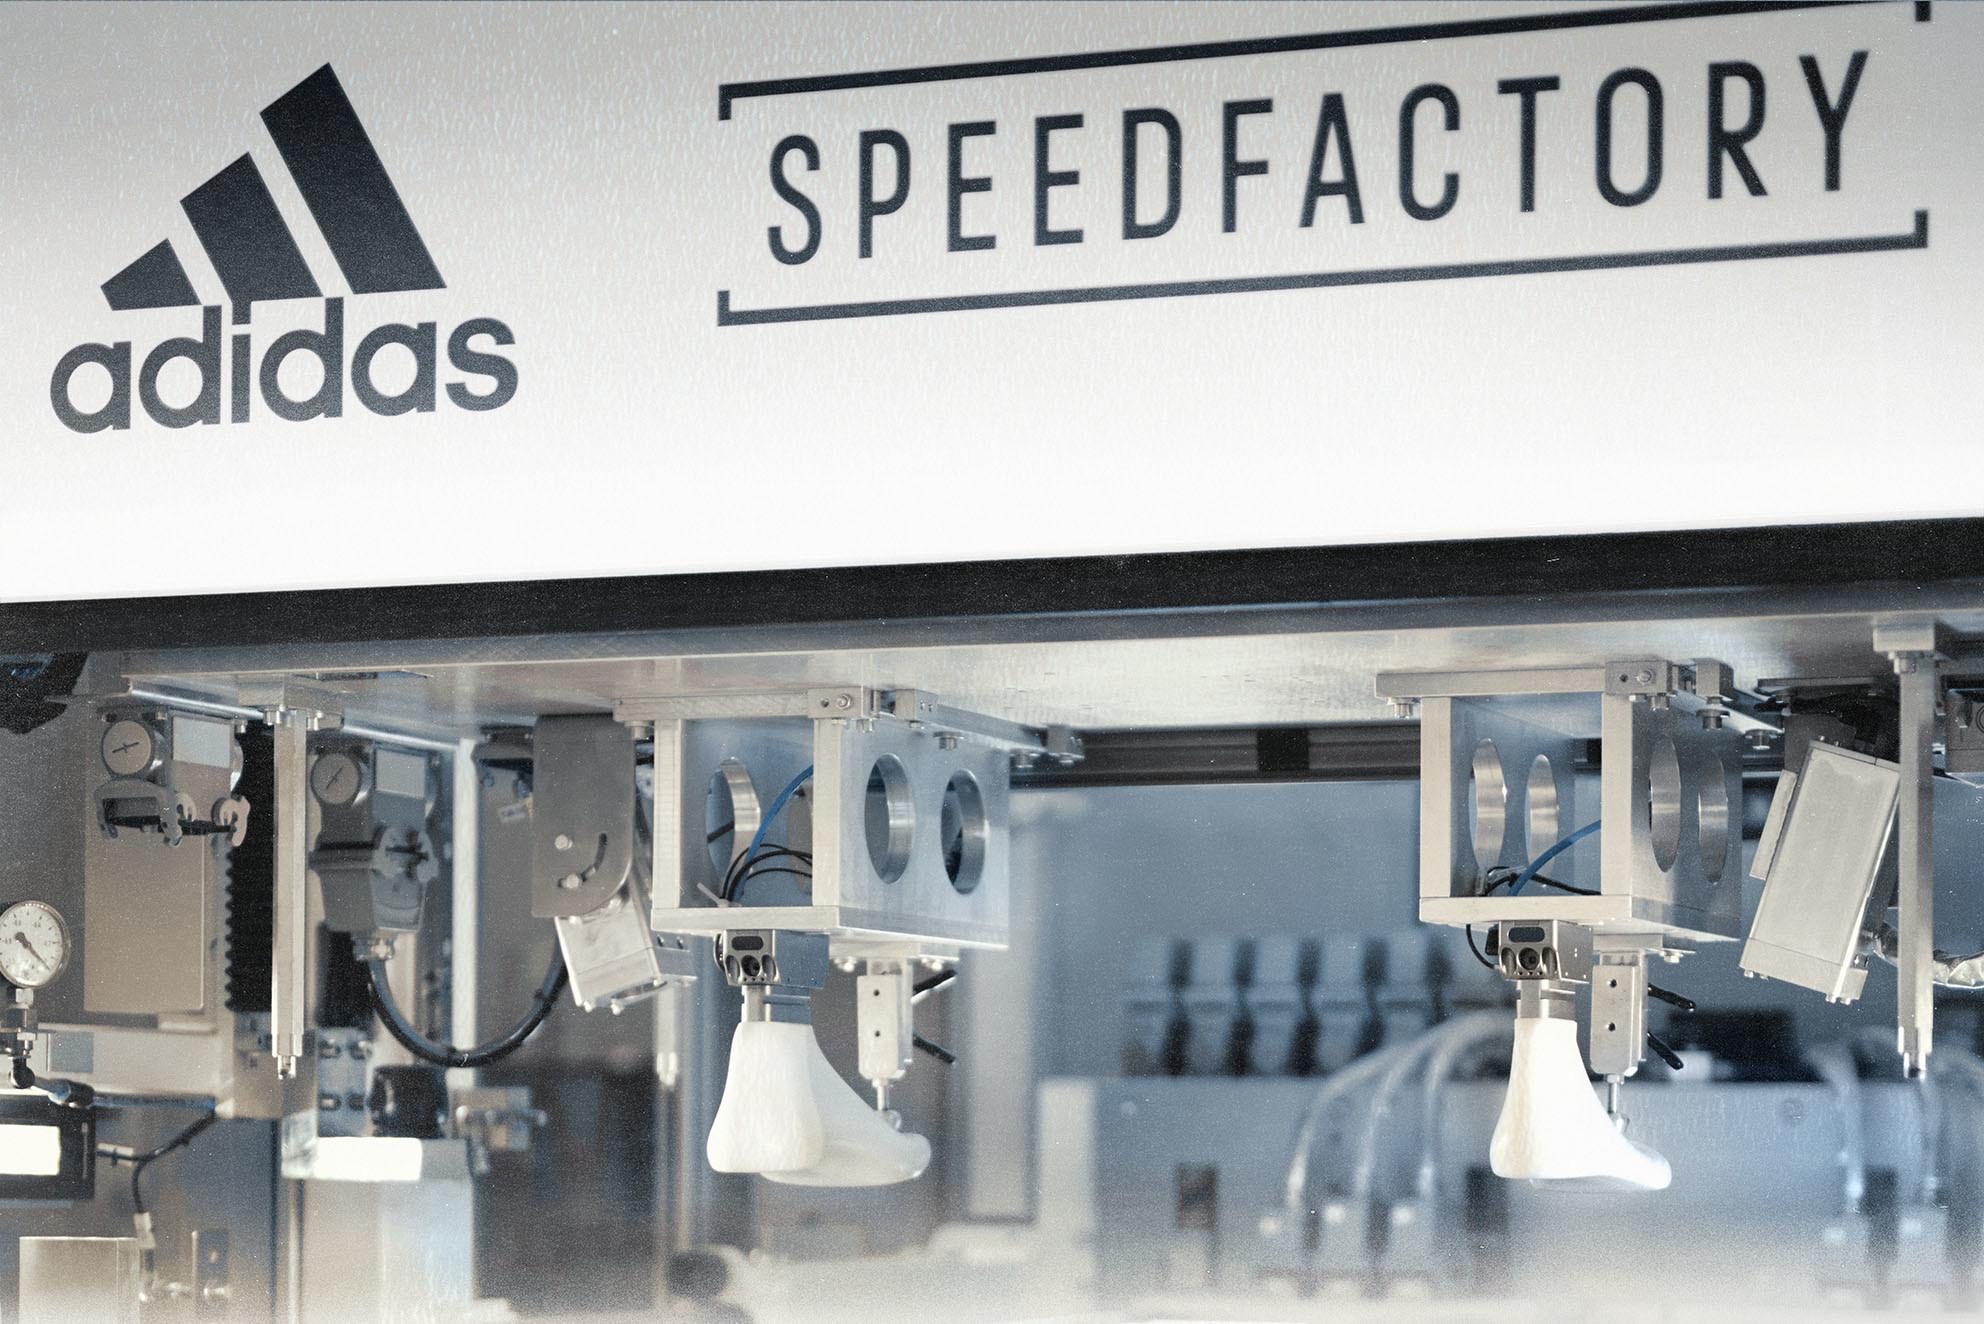 Adidas and Foot Locker are partnering